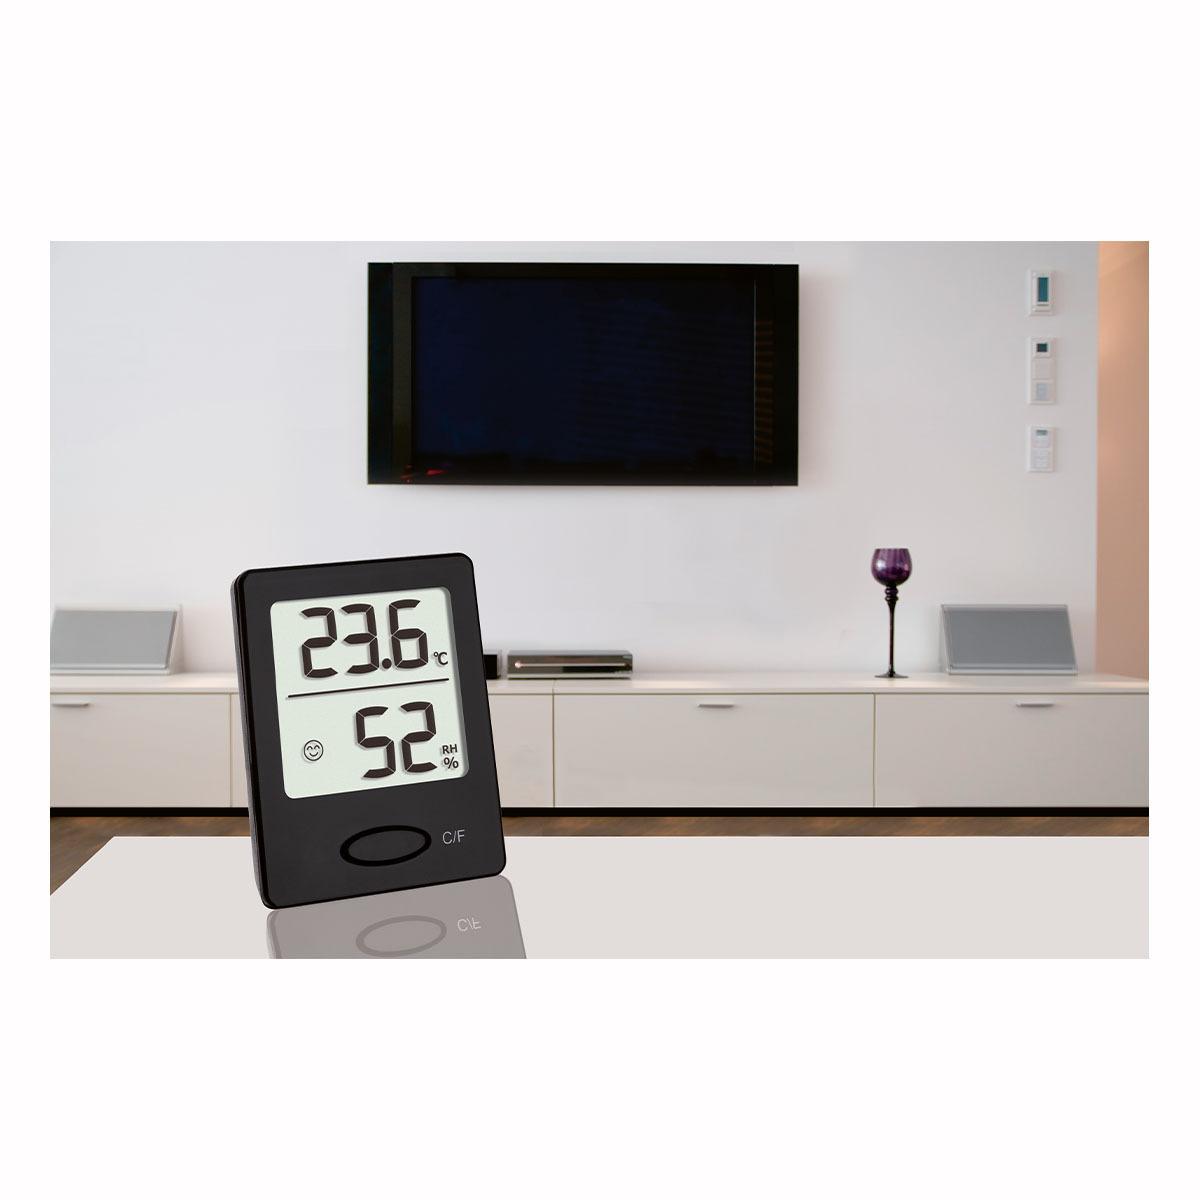 30-5041-01-digitales-thermo-hygrometer-anwendung1-1200x1200px.jpg